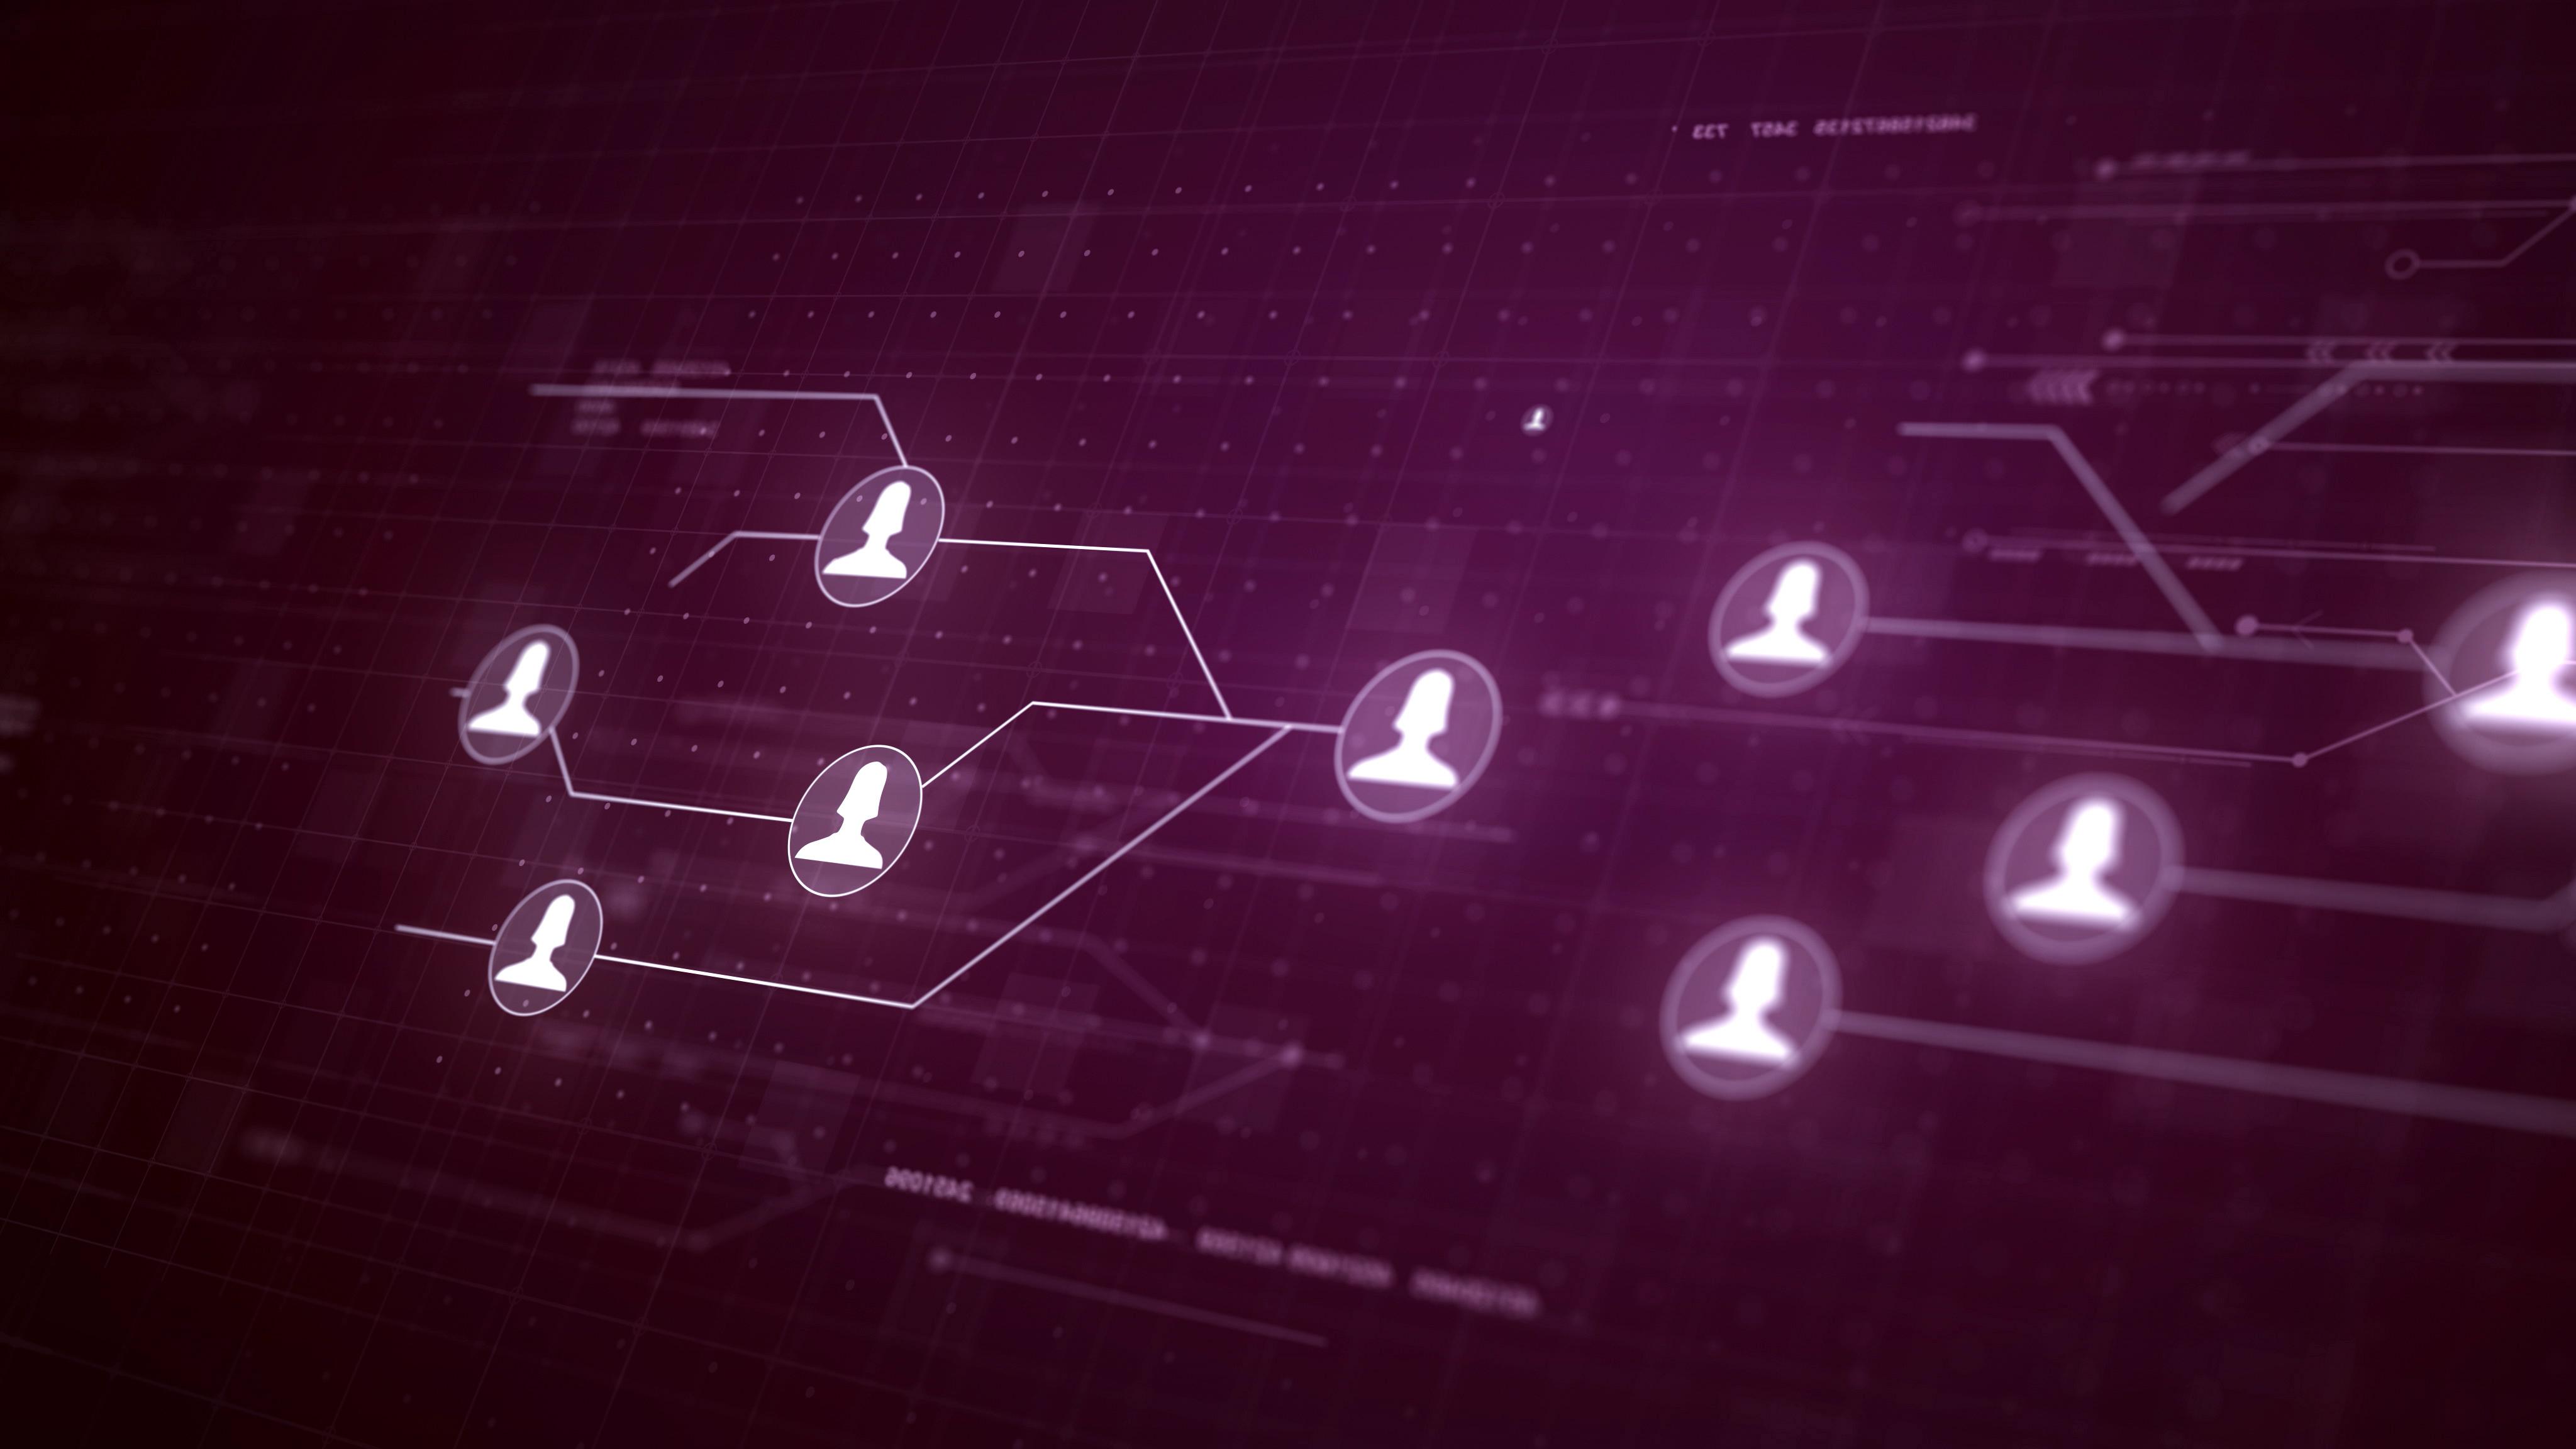 user-people-network-circuit-board-link-c